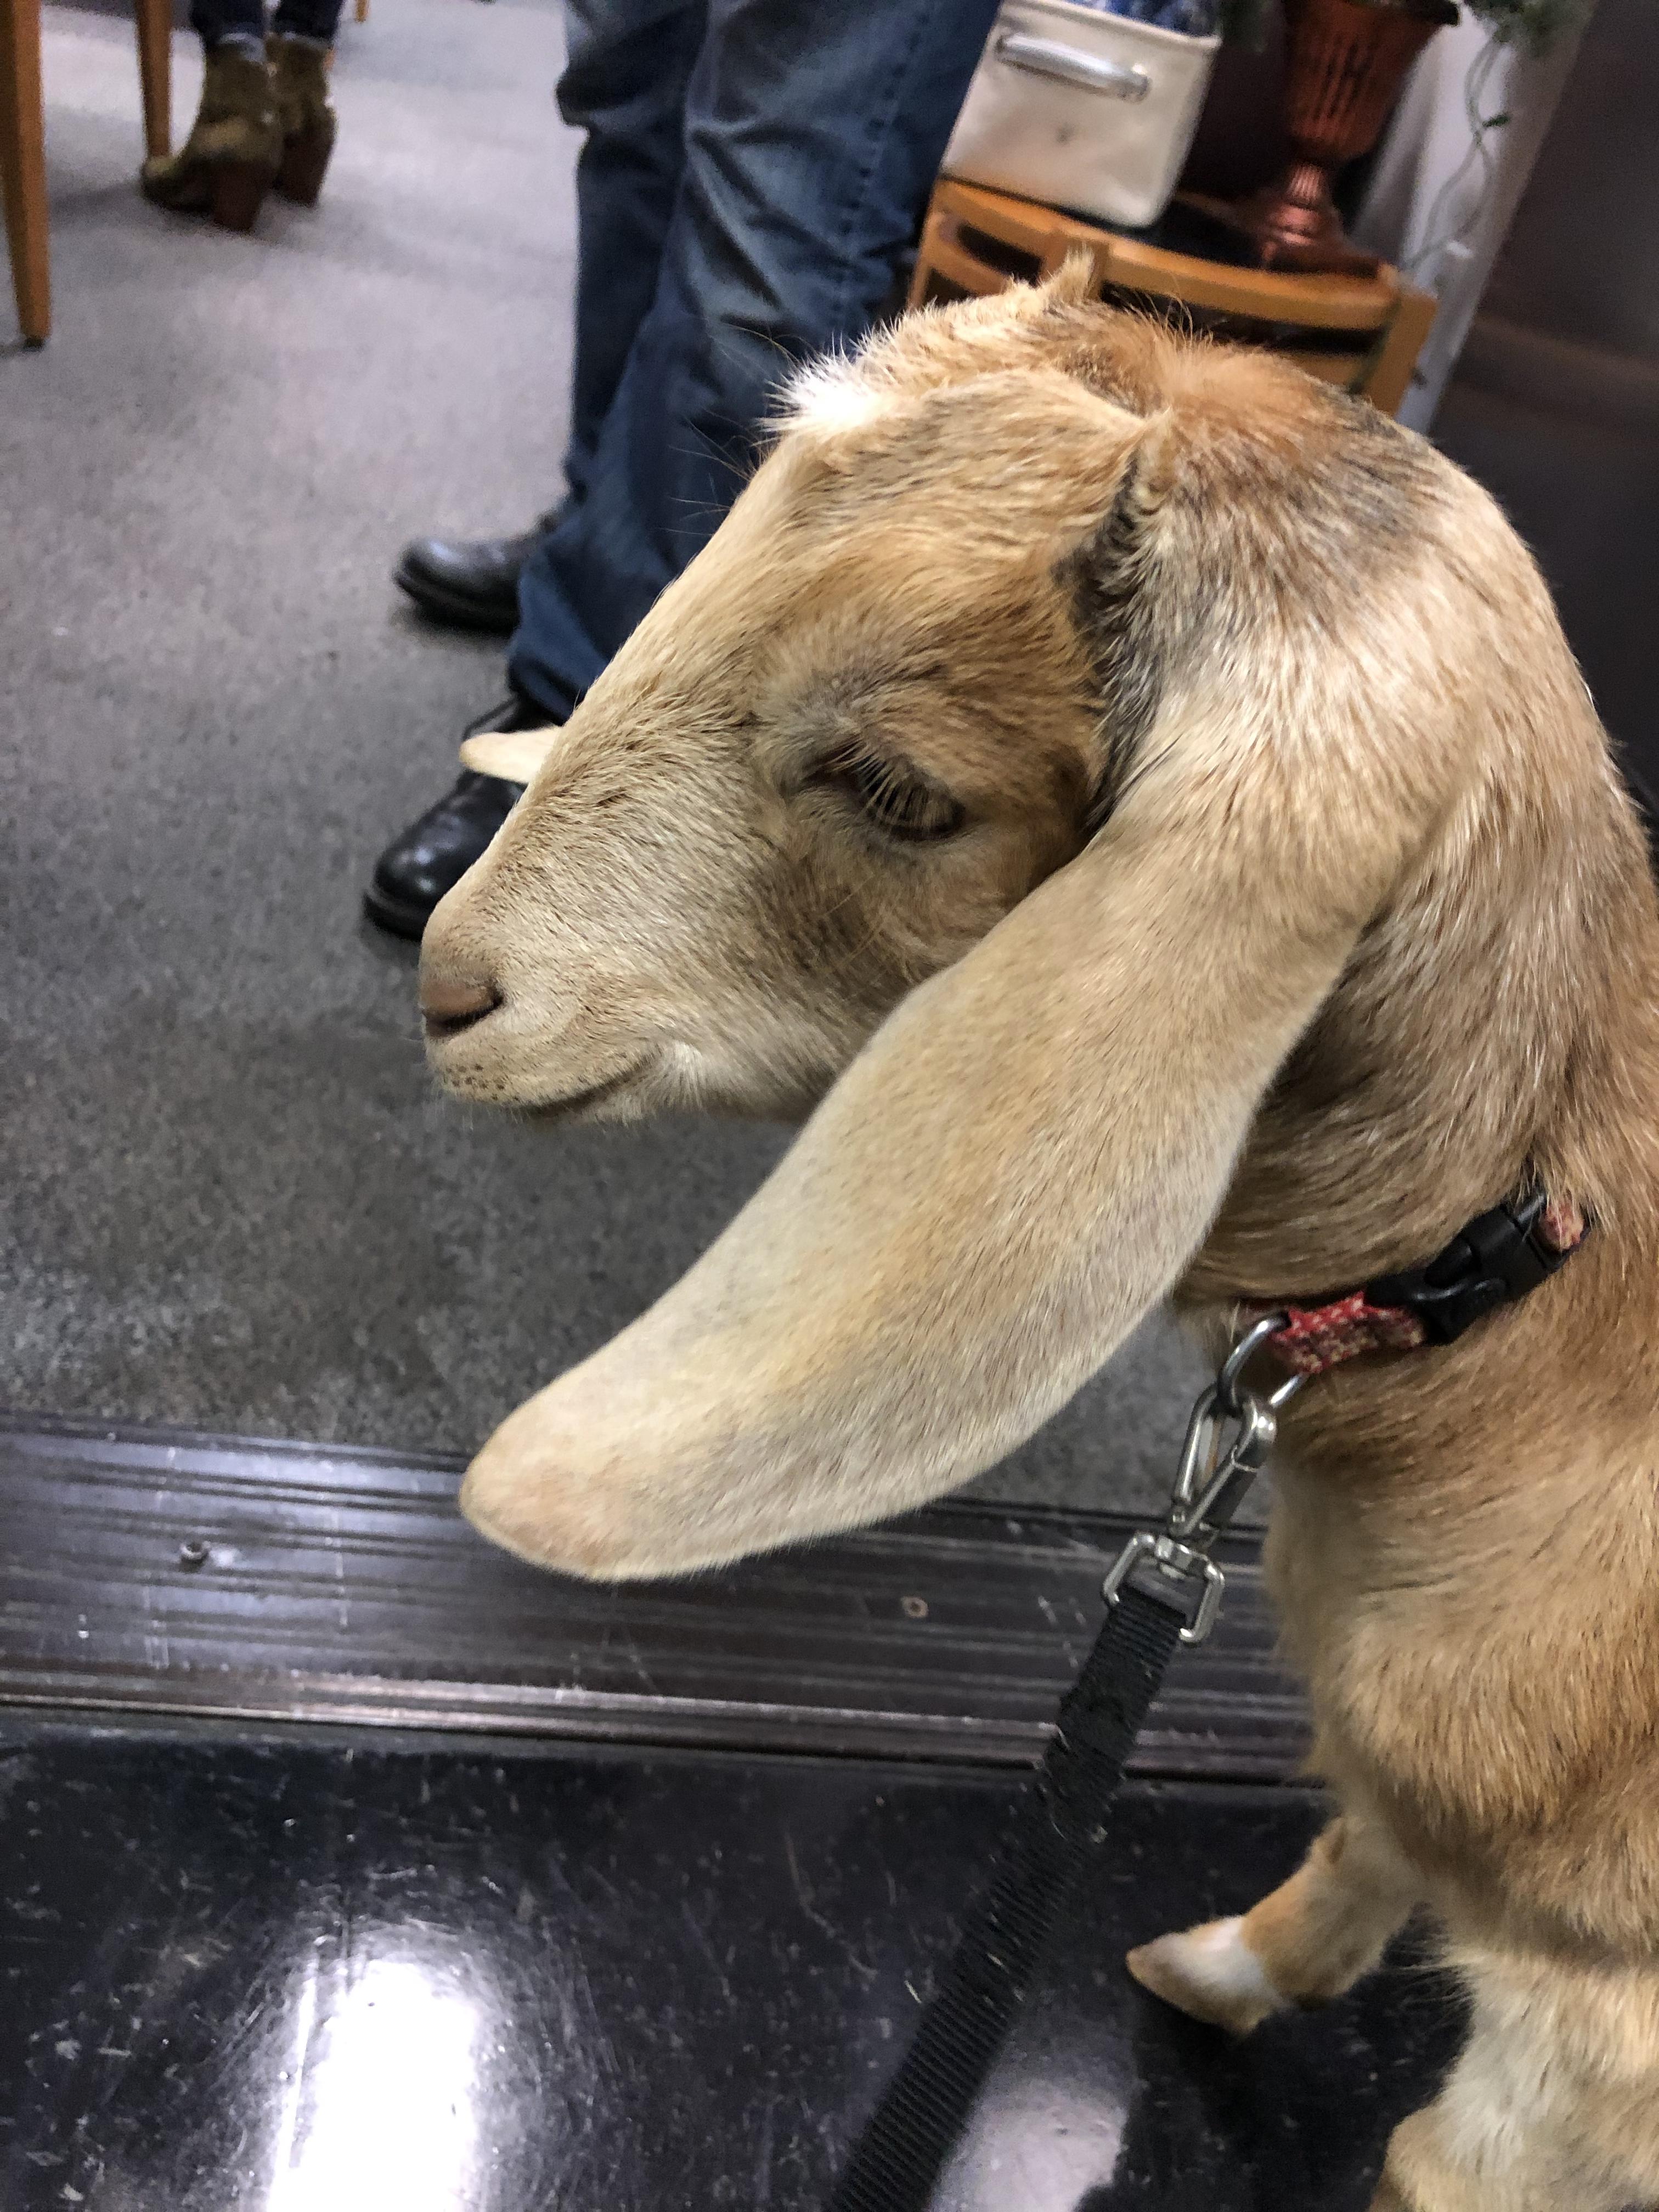 Millie the Goat!